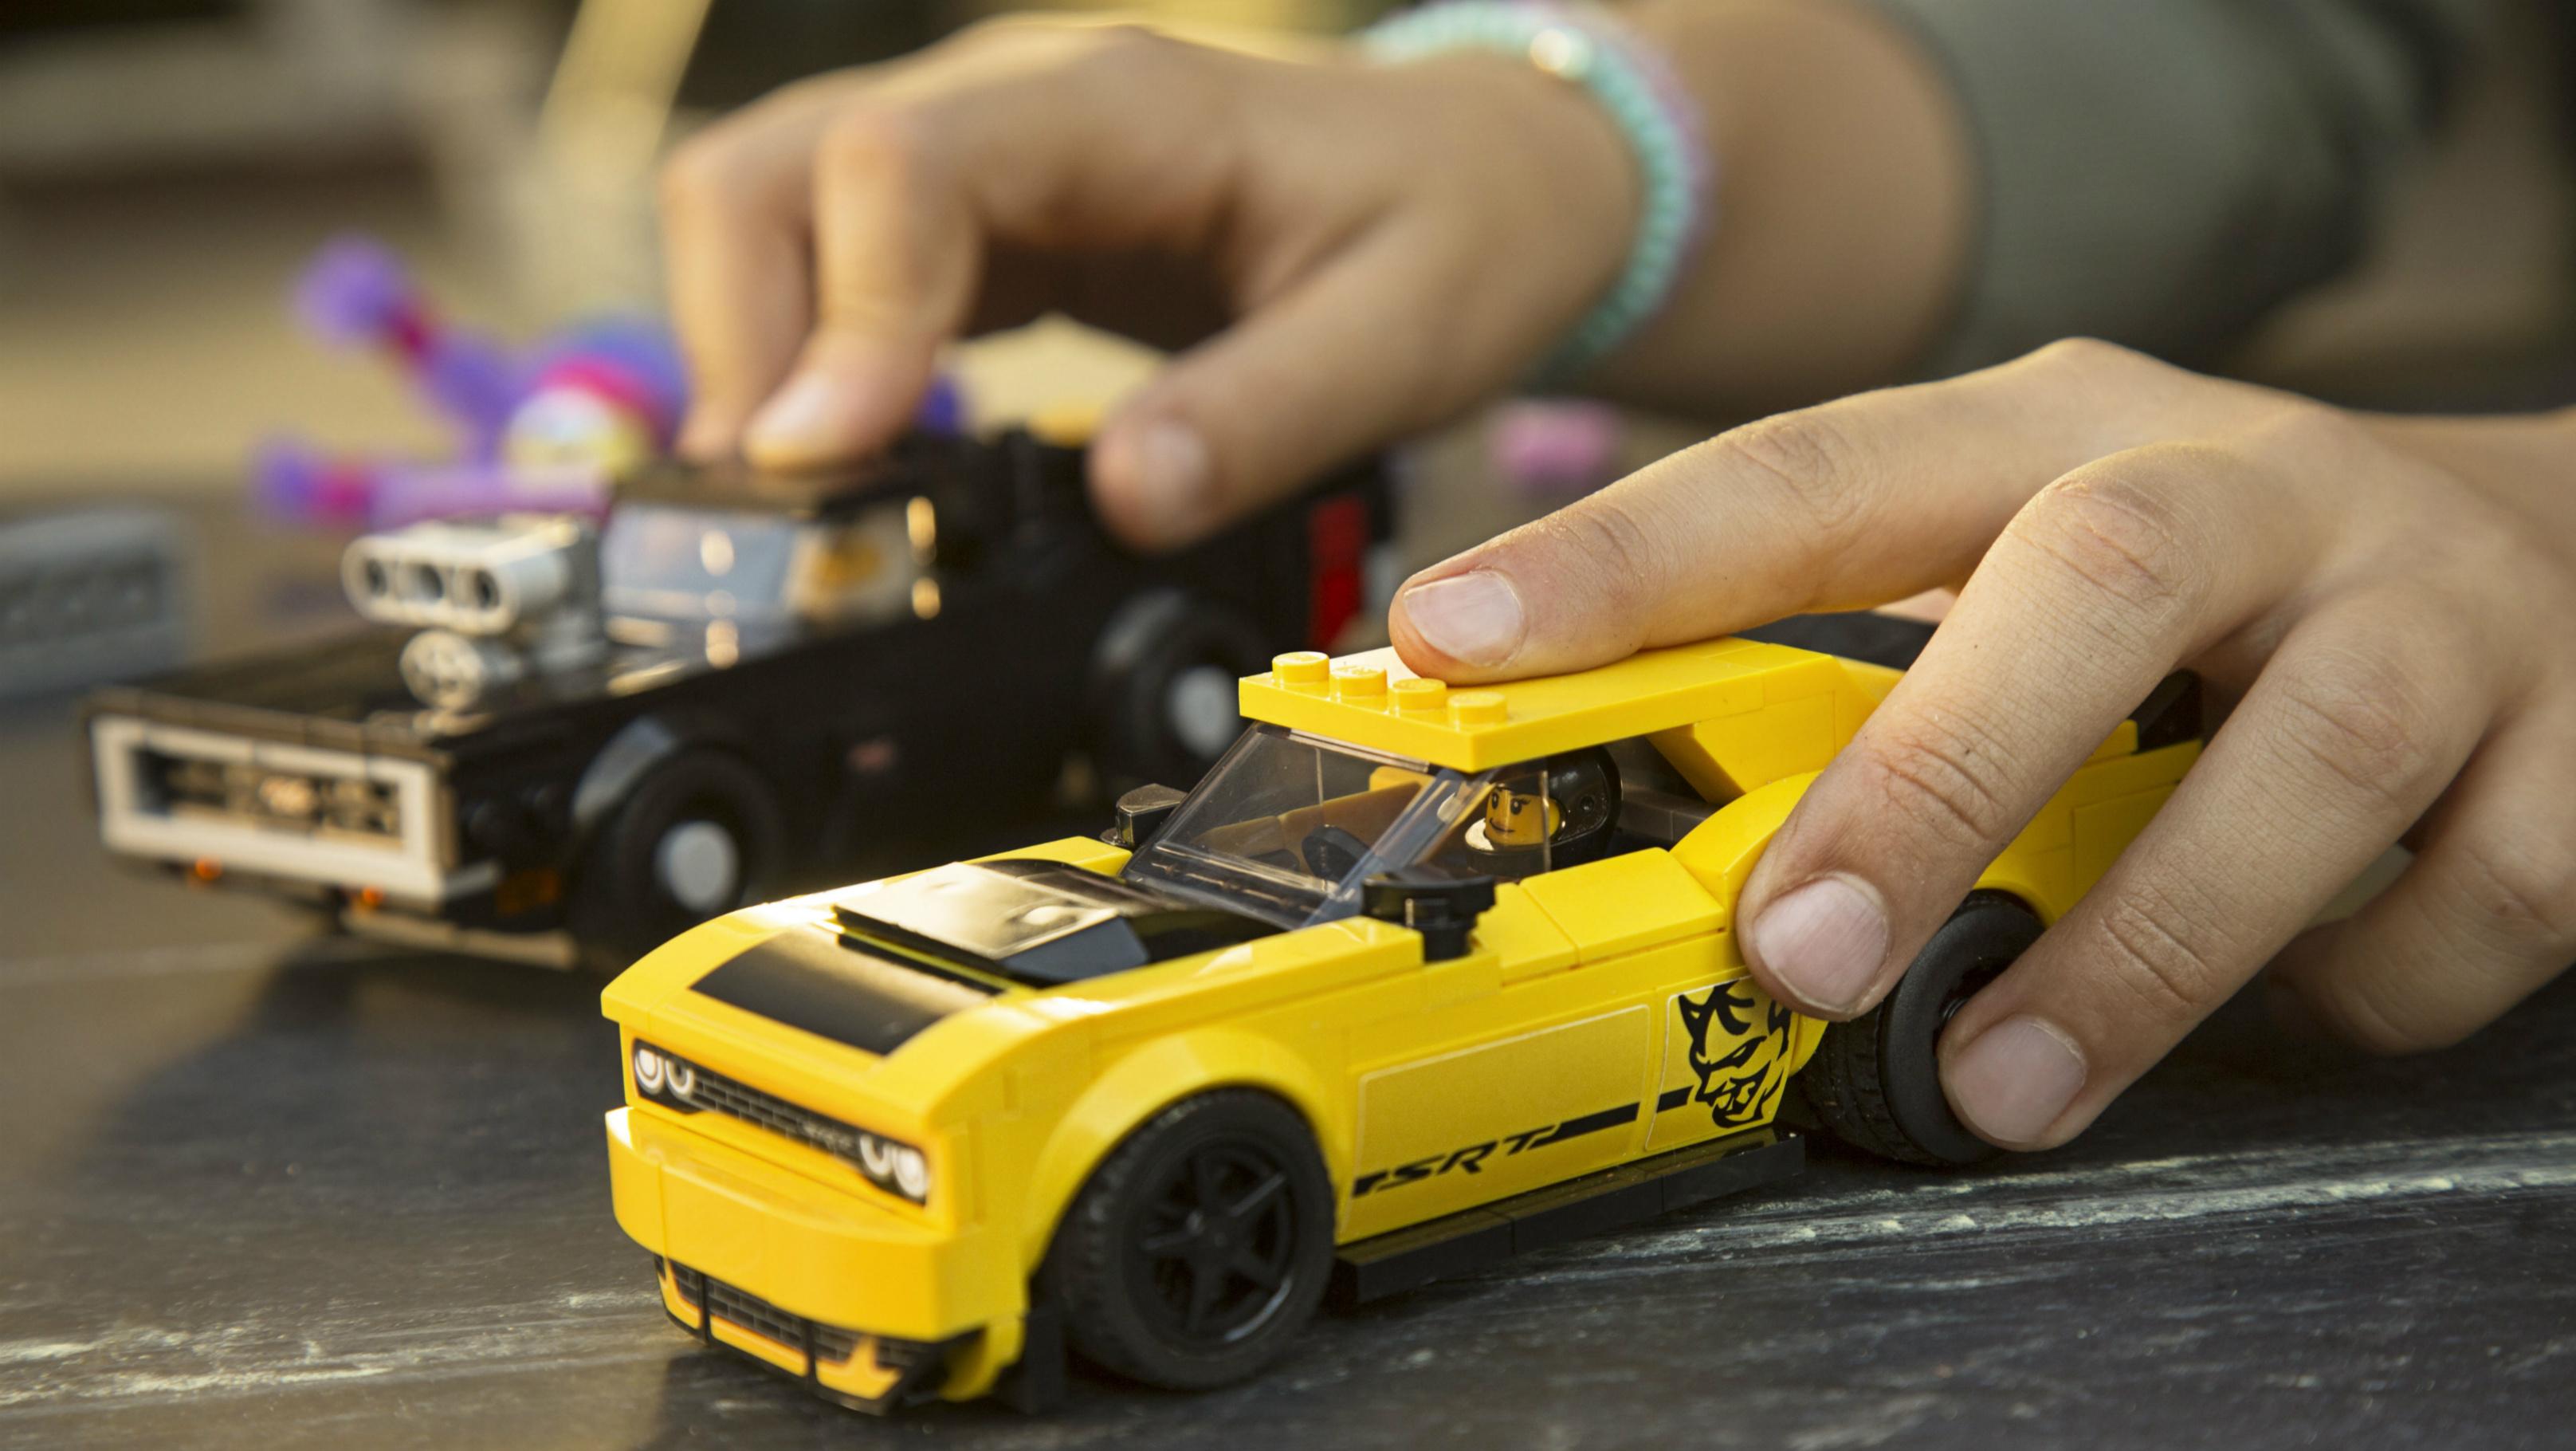 LEGO Speed Champions building set